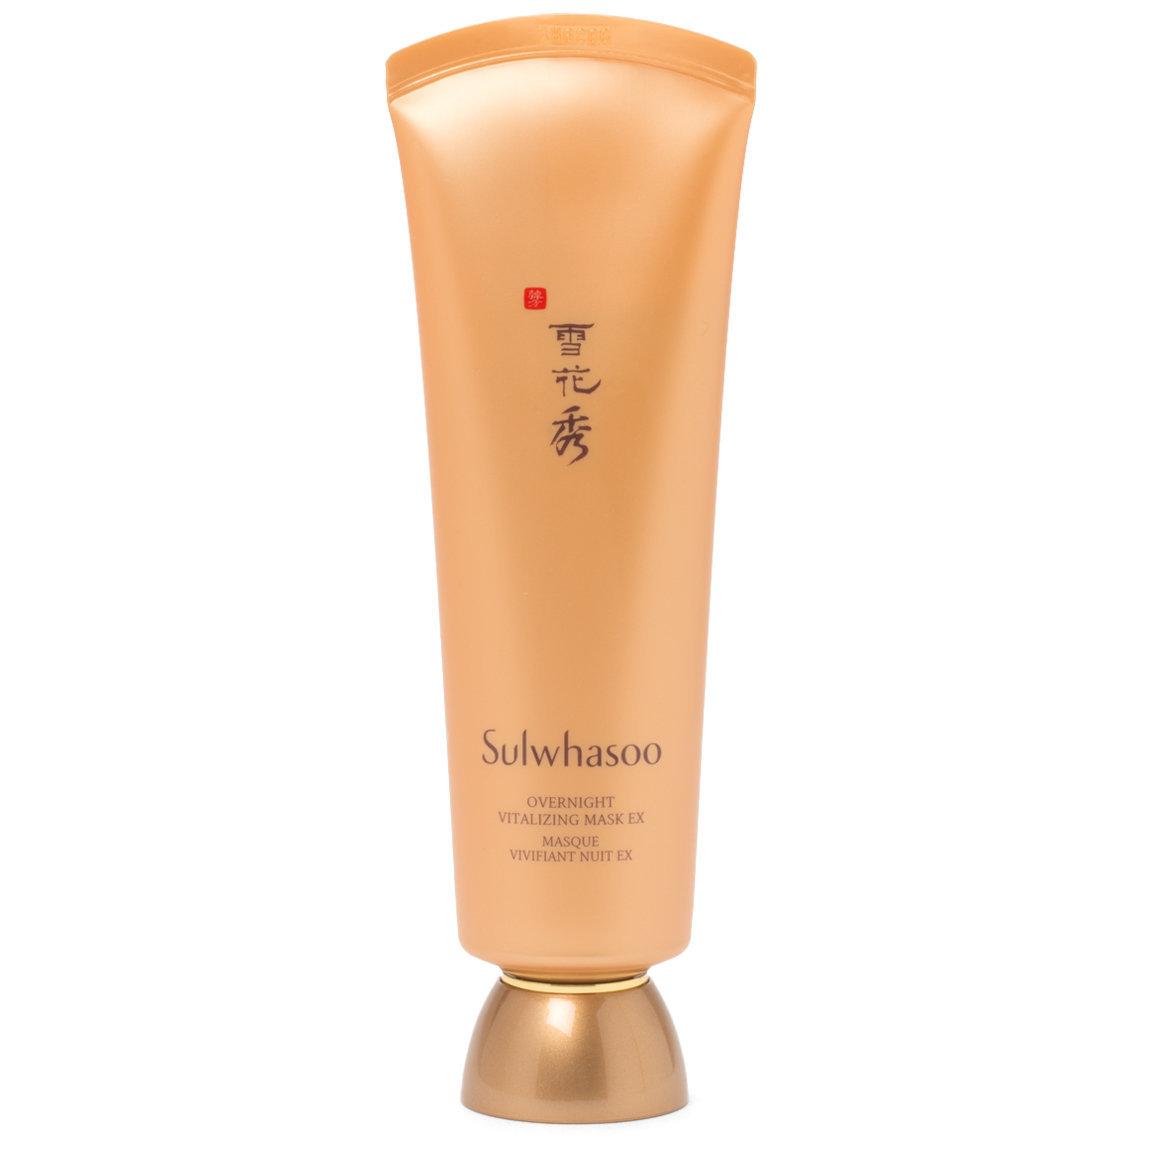 Sulwhasoo Overnight Vitalizing Mask product swatch.